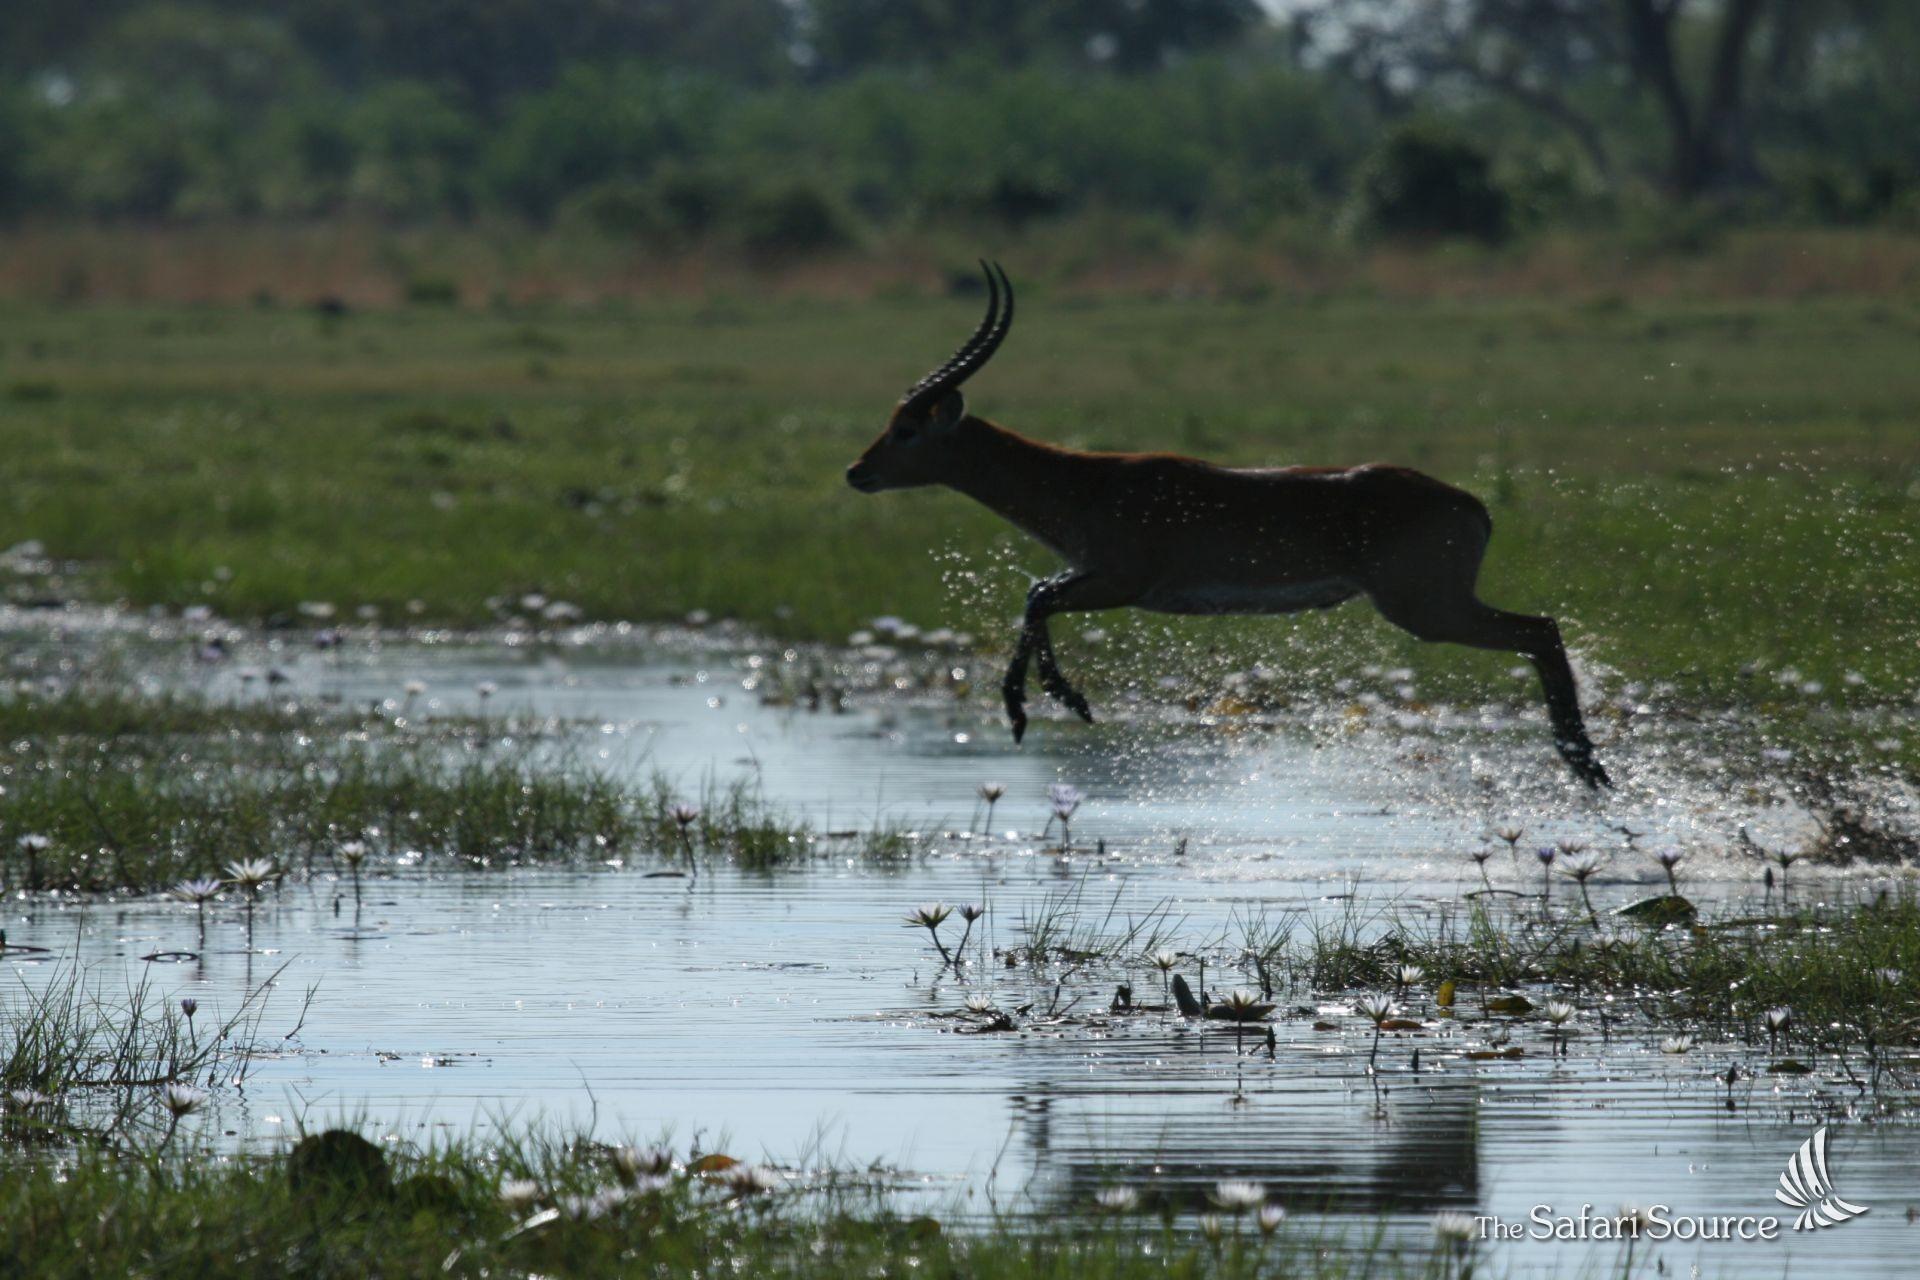 A Lechwe Antelope crossing waters in the Okavango Delta, Botswana.